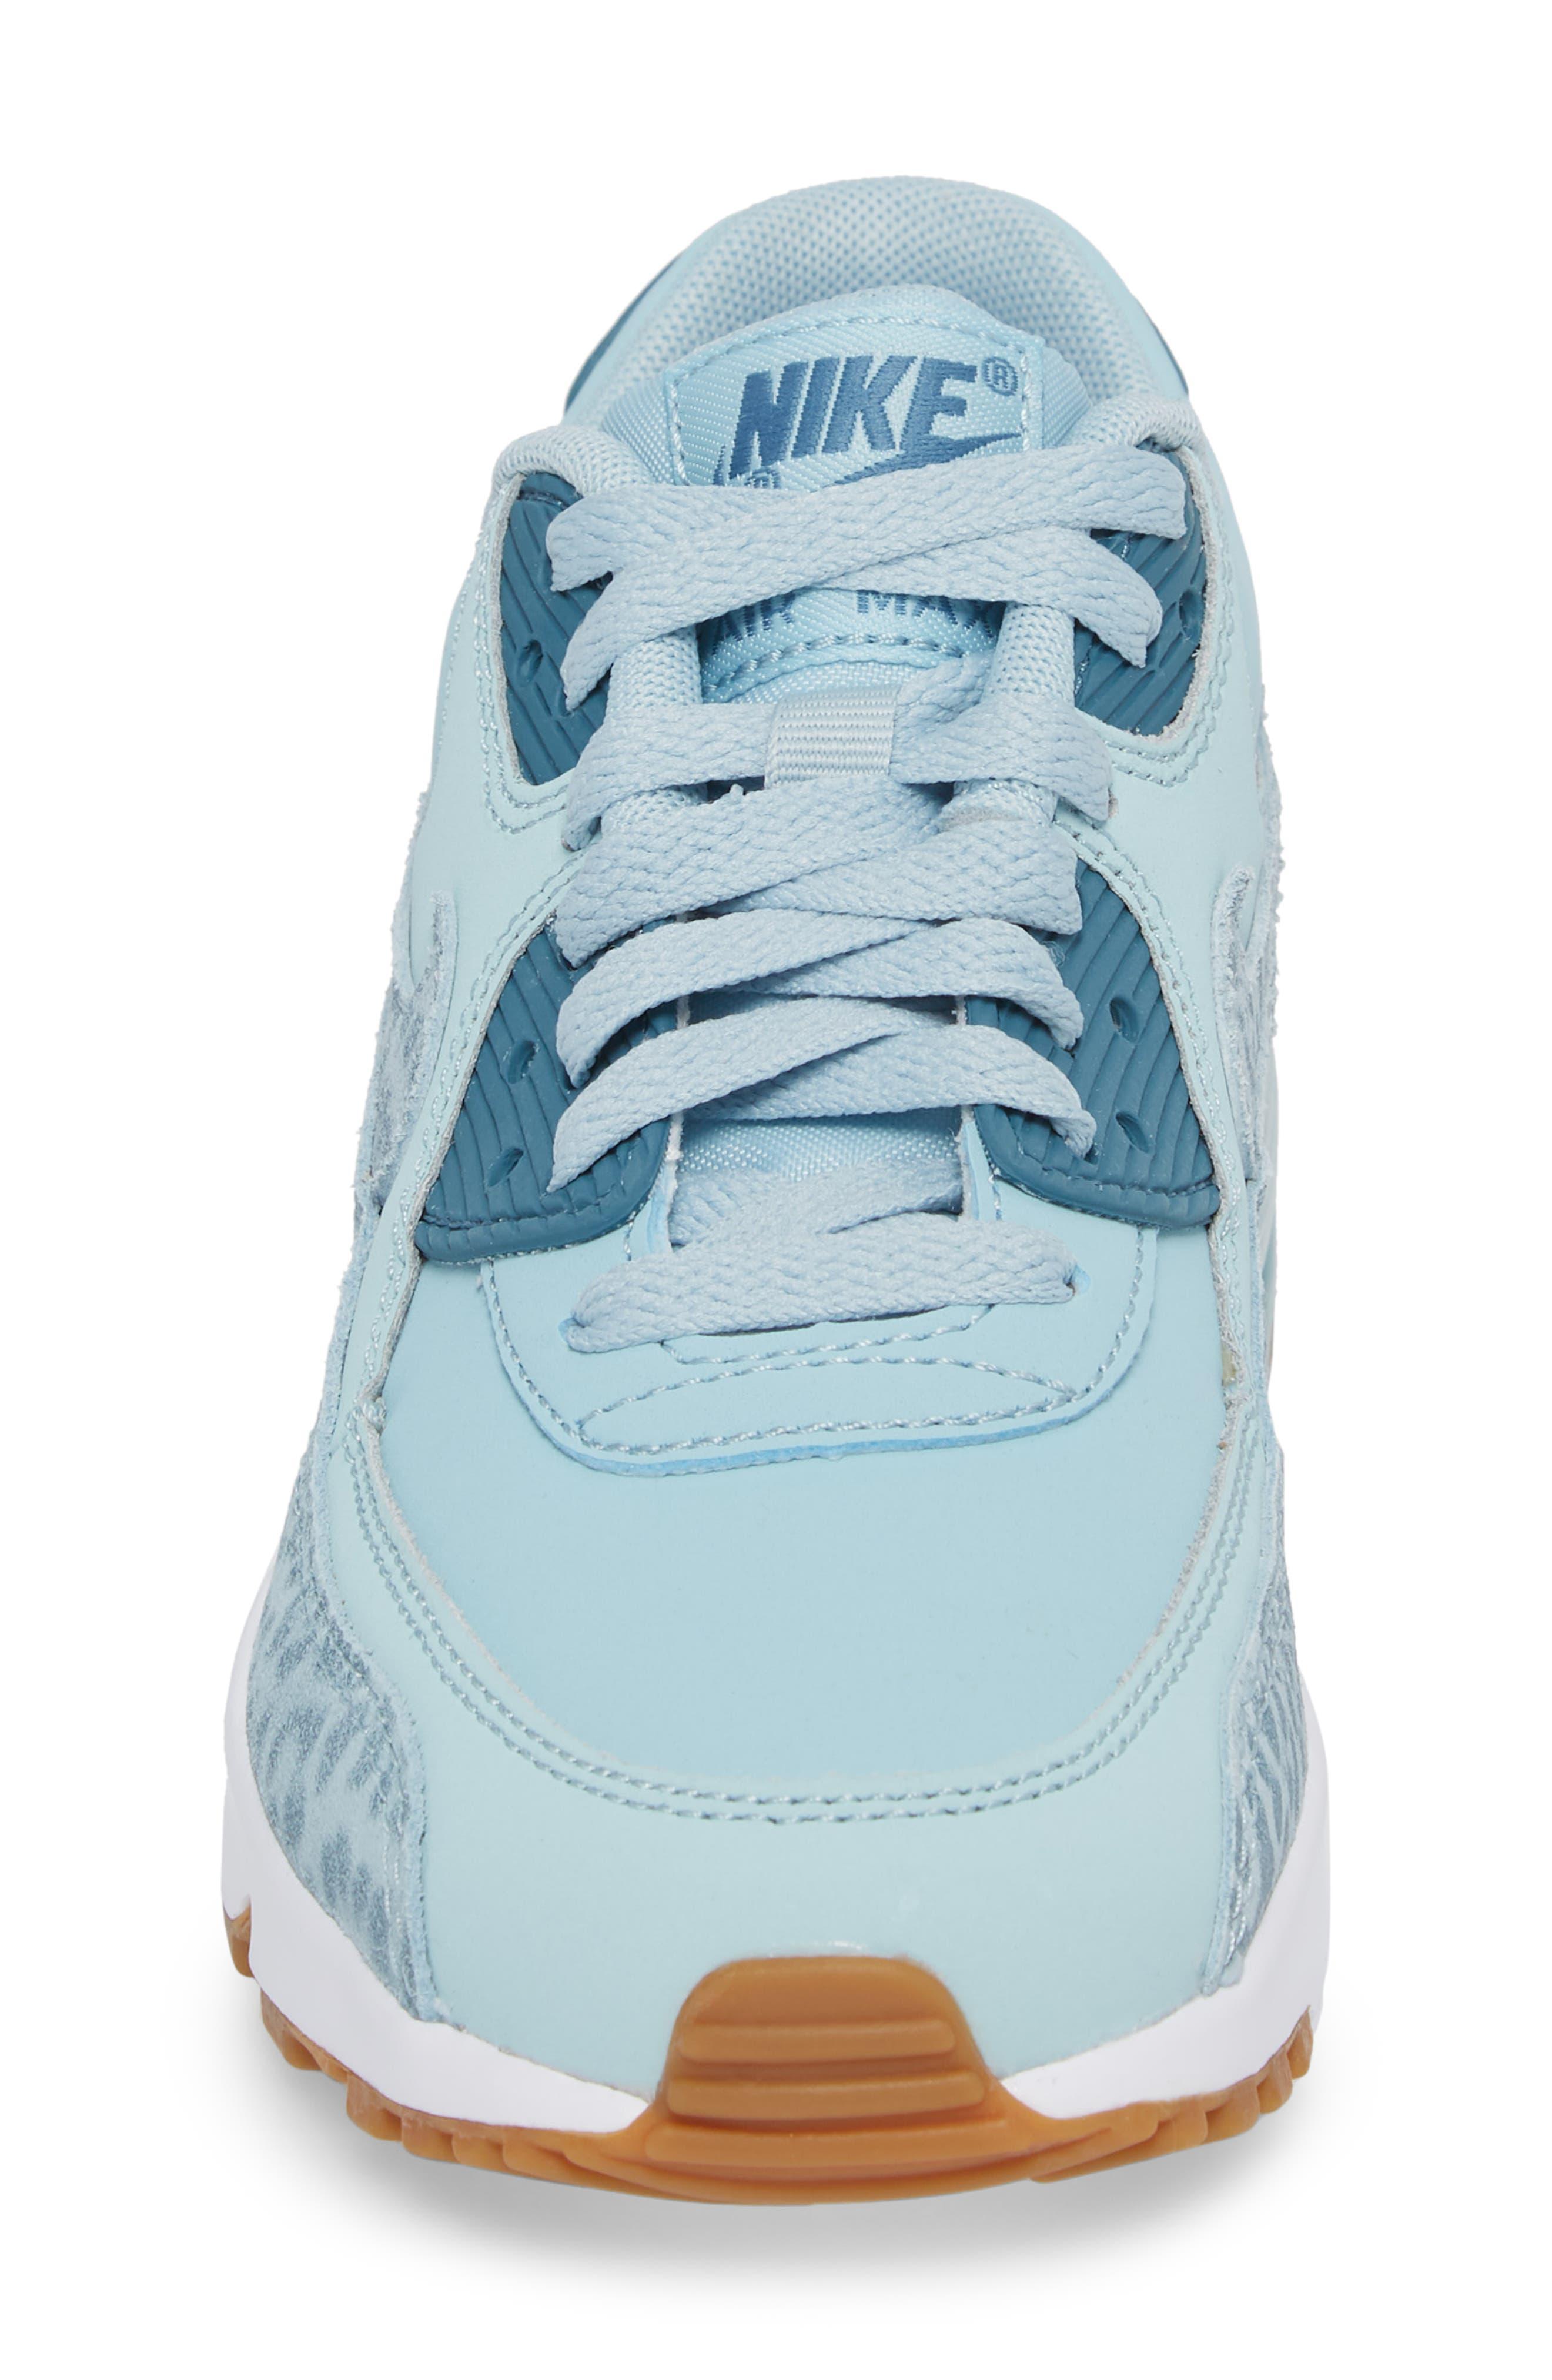 Air Max 90 Leather Sneaker,                             Alternate thumbnail 4, color,                             Ocean Bliss/ Noise Aqua/ White